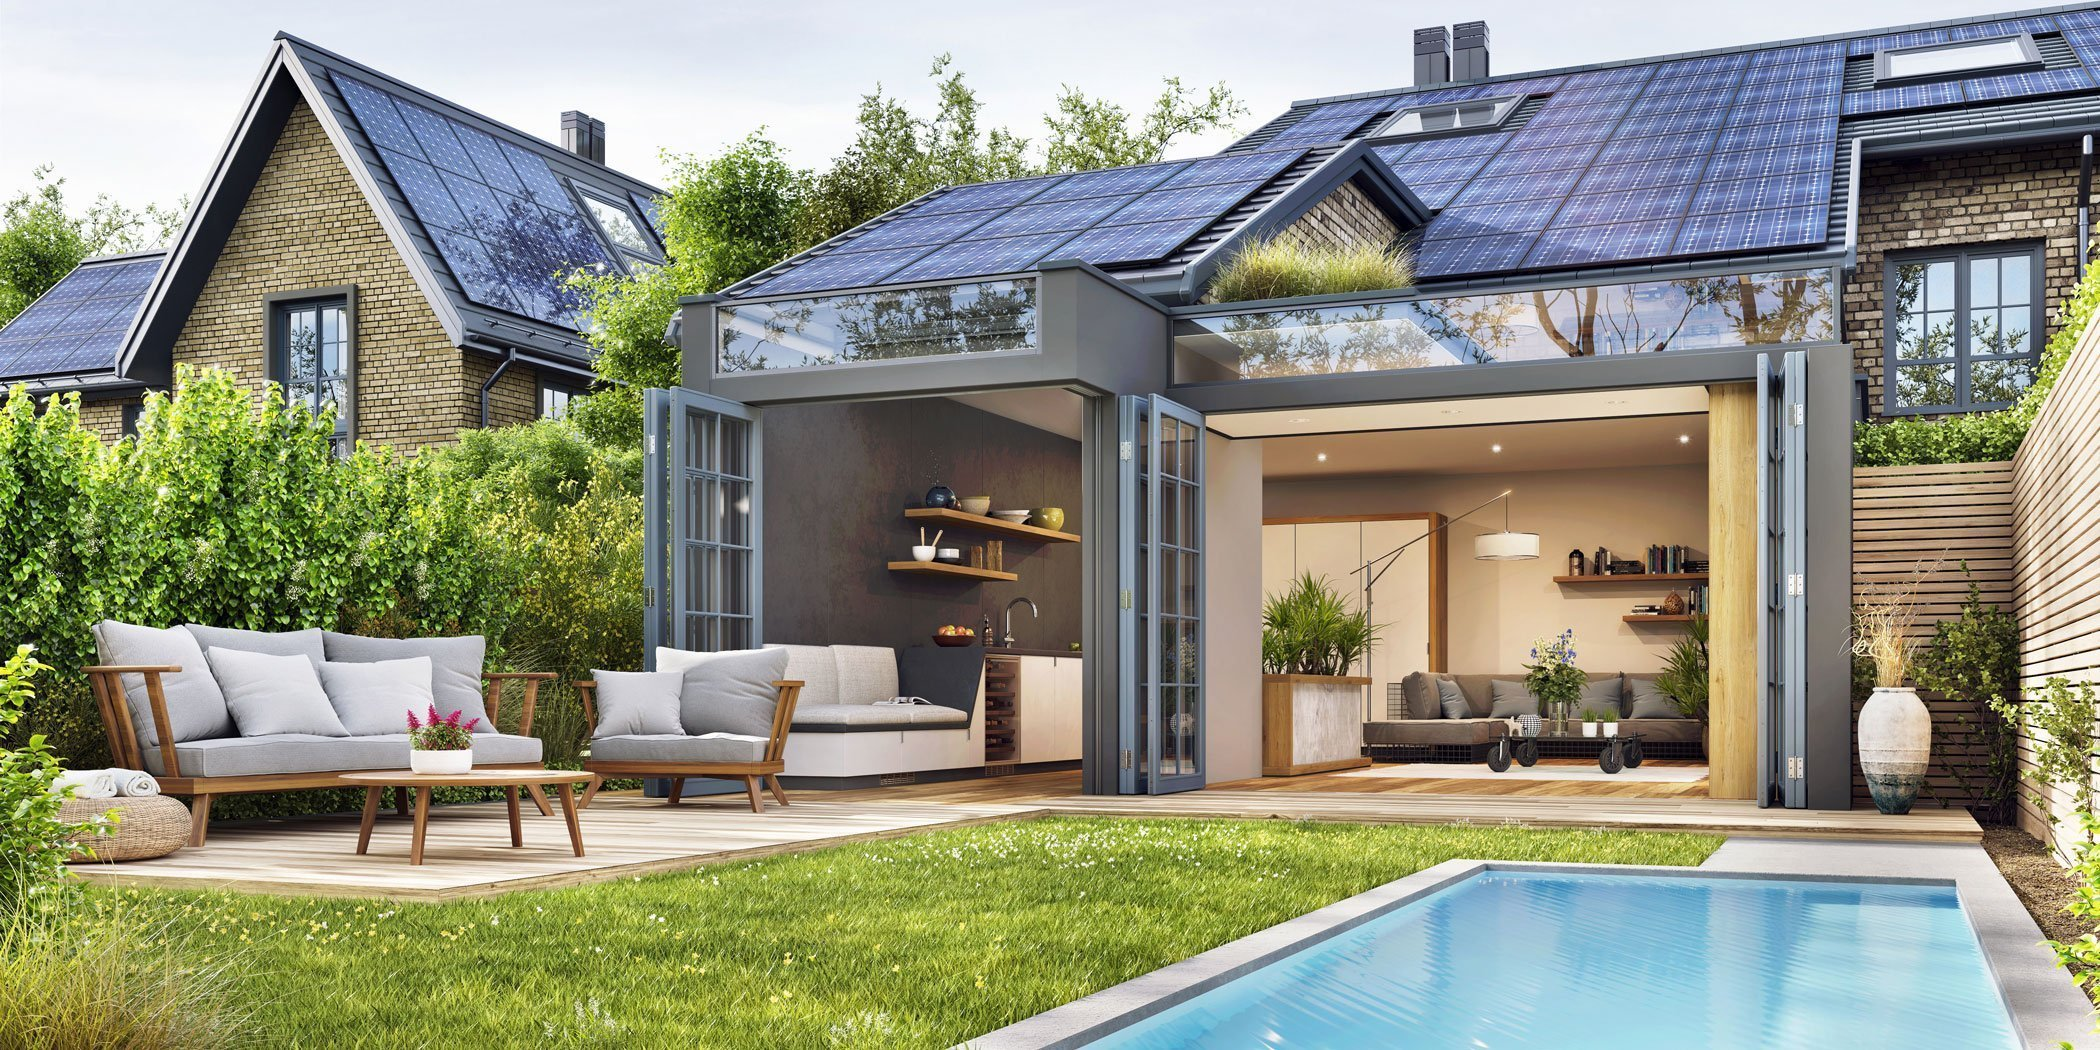 house pool | Alta Capital Group